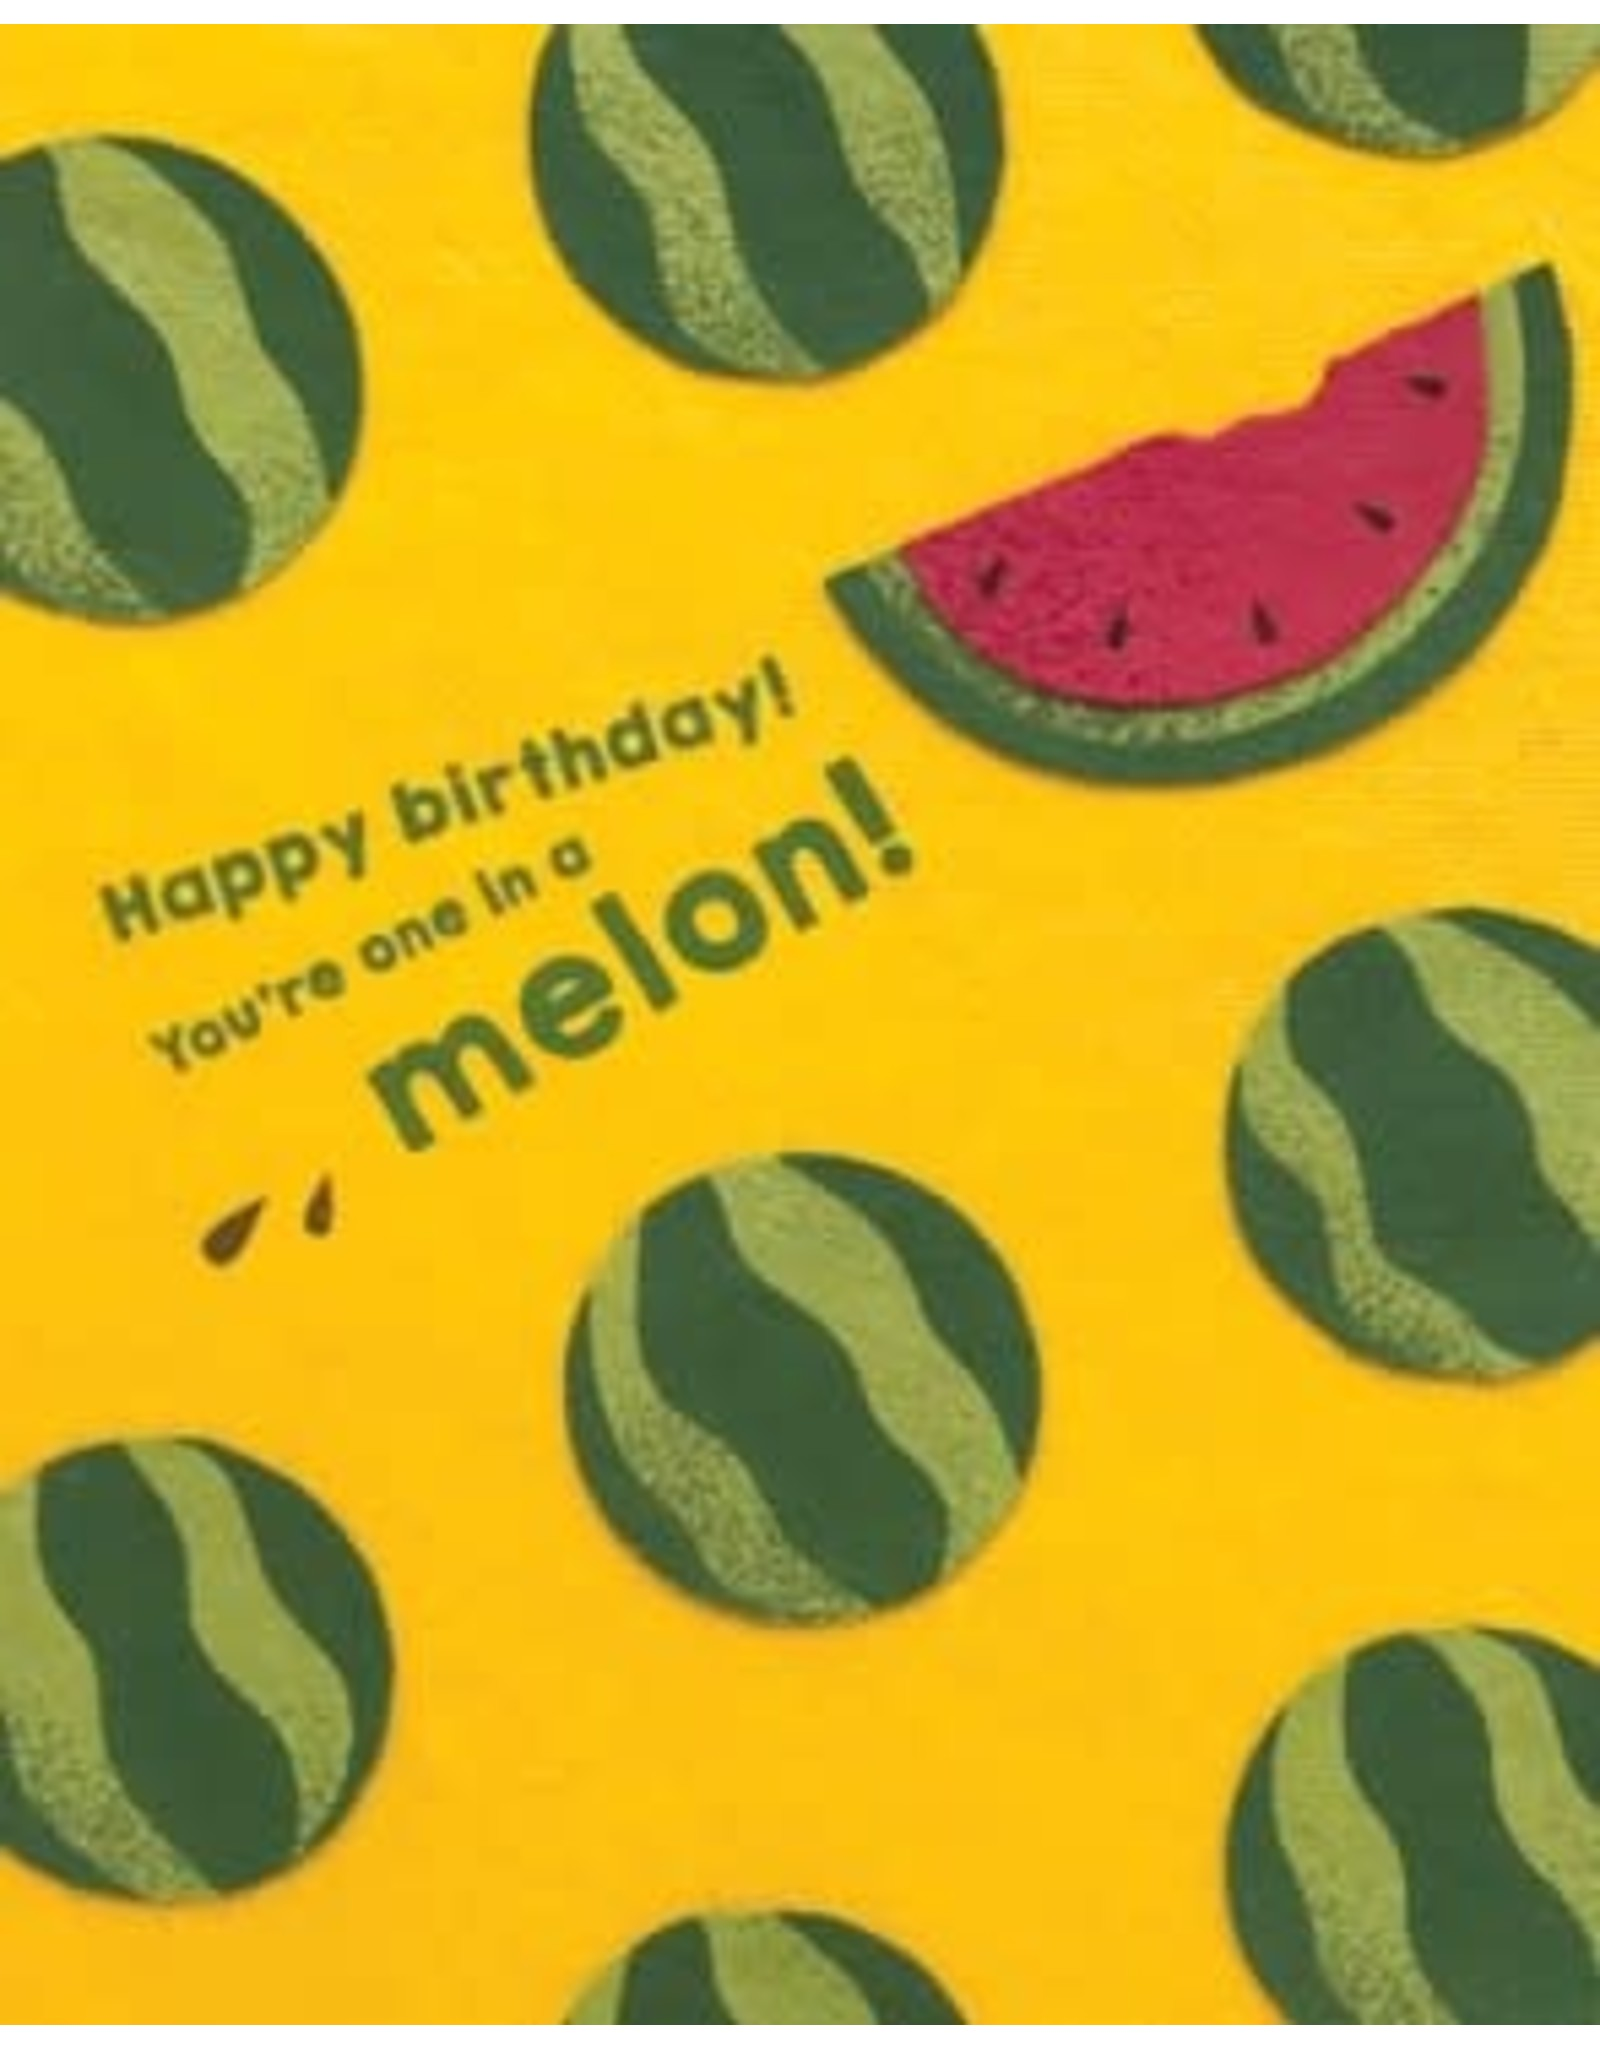 One Melon Birthday Greeting Card